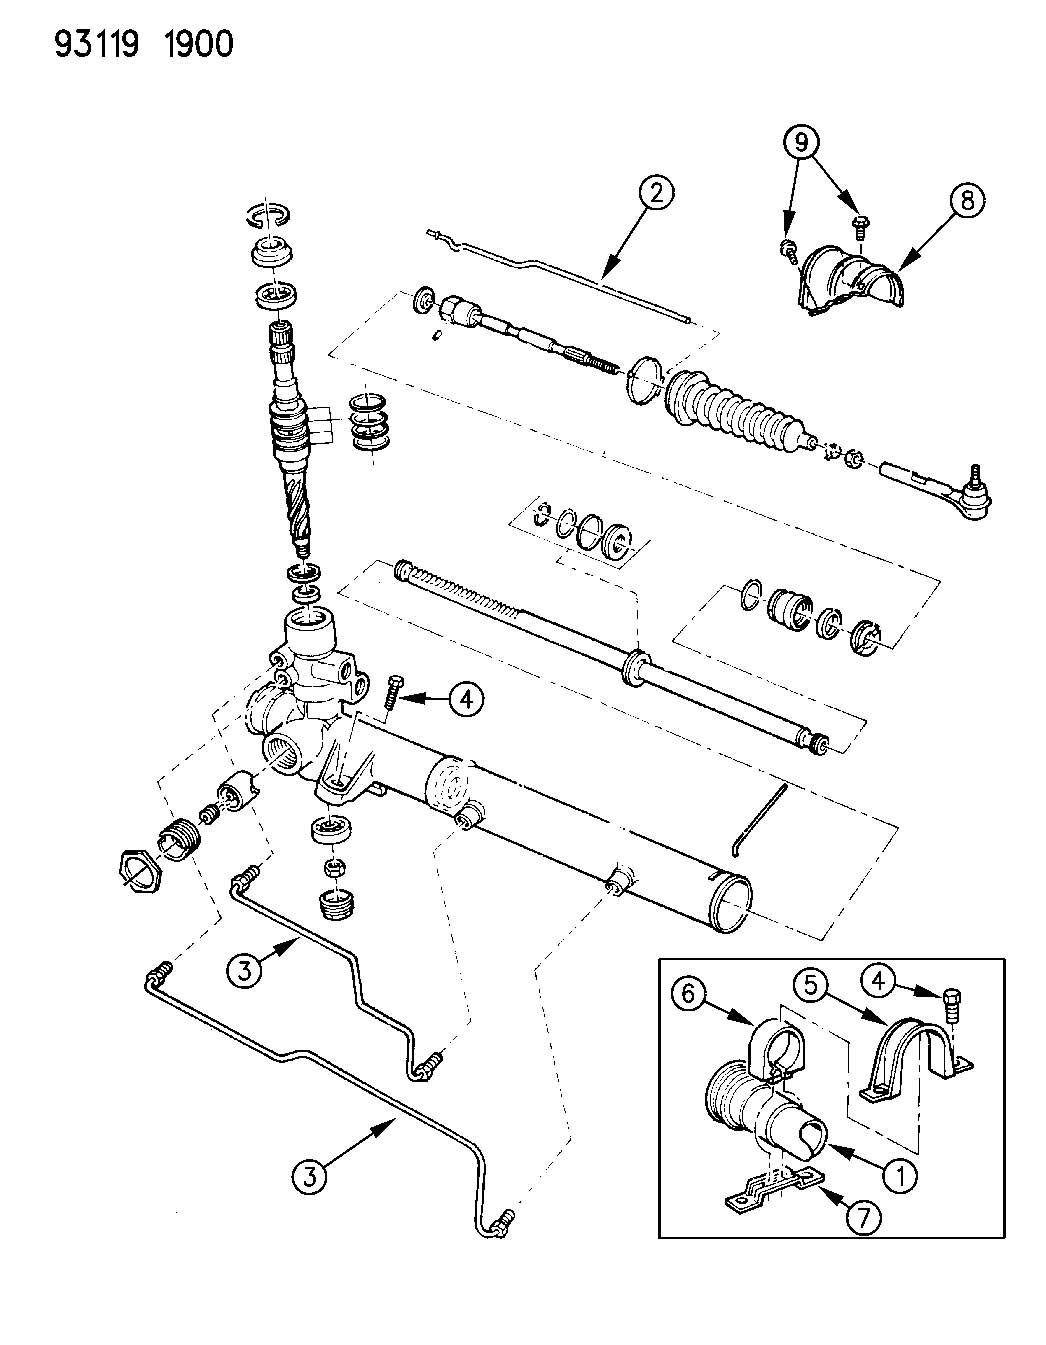 Service manual [Change A 1993 Dodge Caravan Rack And